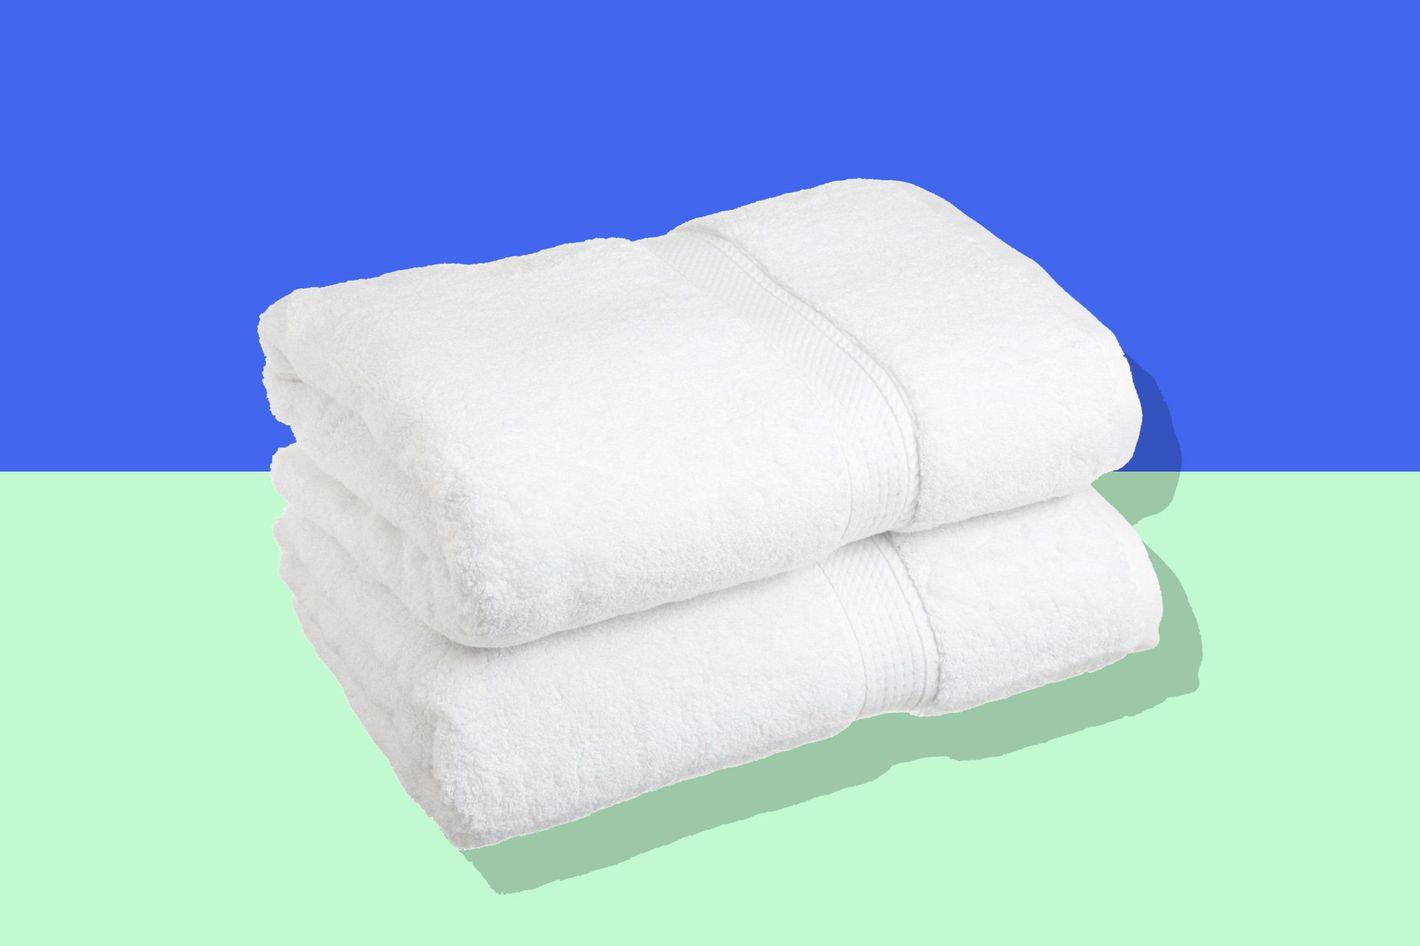 luxury hotel towels on sale. Black Bedroom Furniture Sets. Home Design Ideas